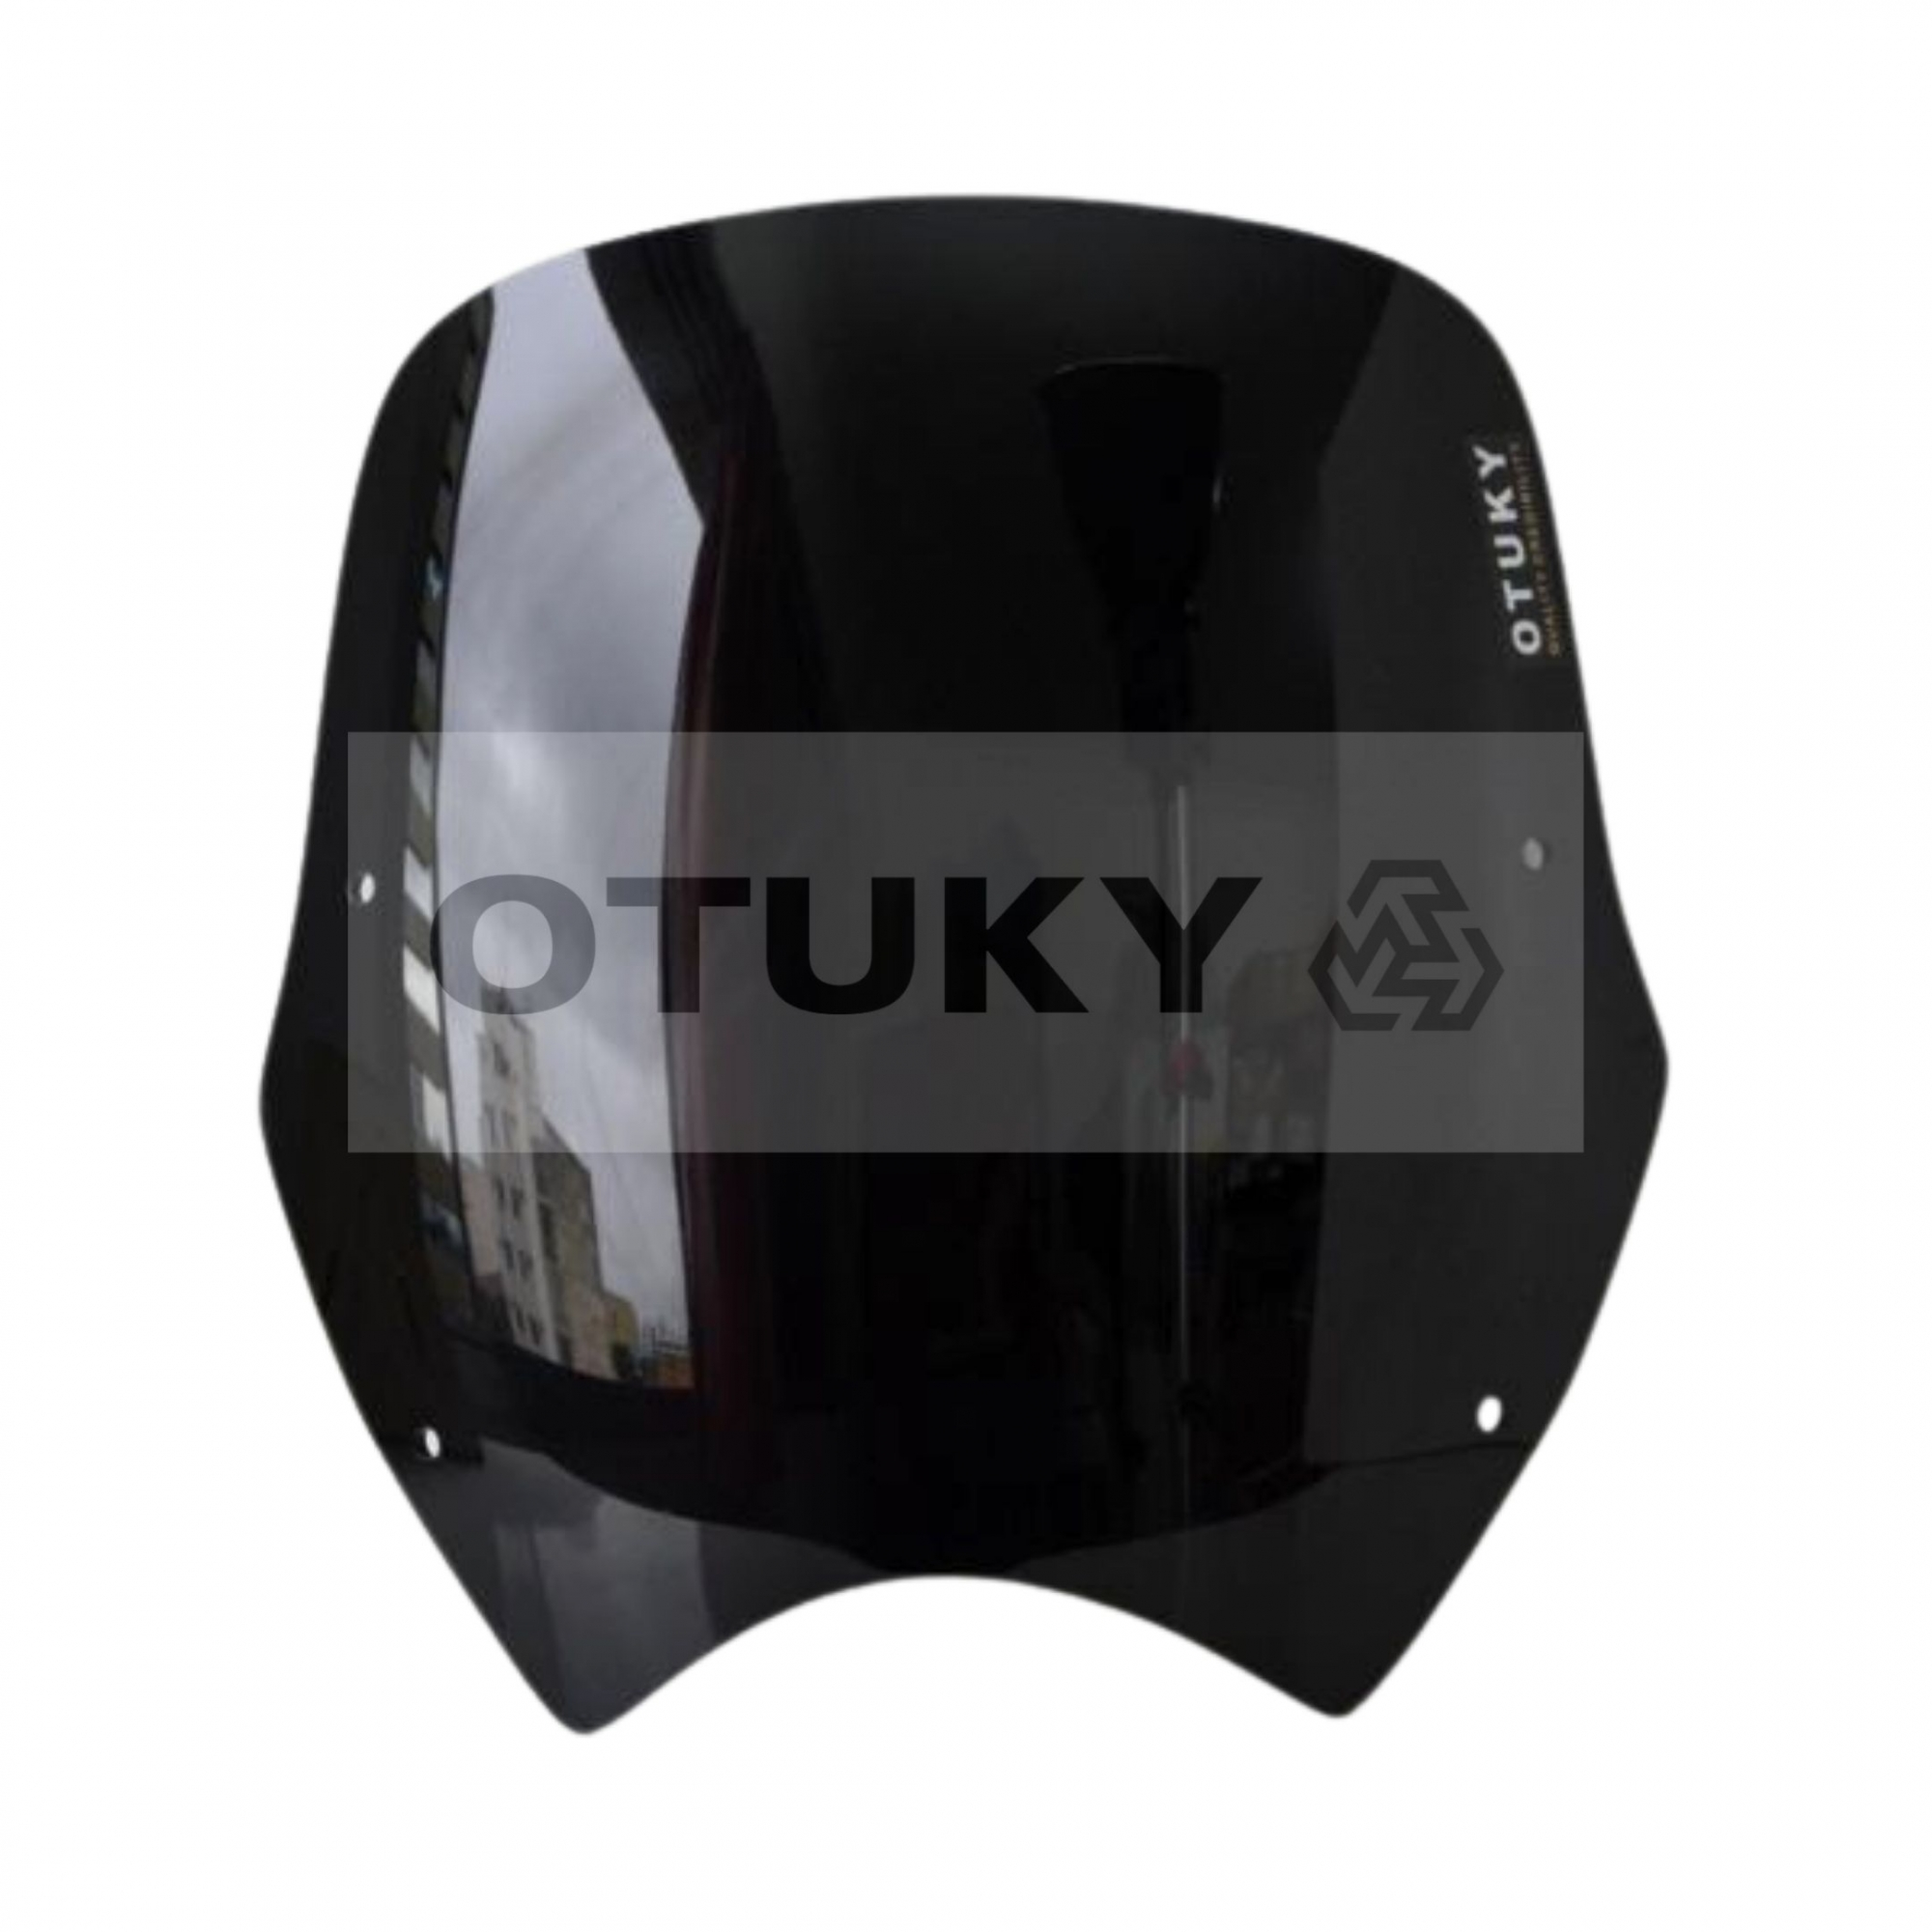 Bolha para Moto Transalp XL 700 V Otuky Padrão